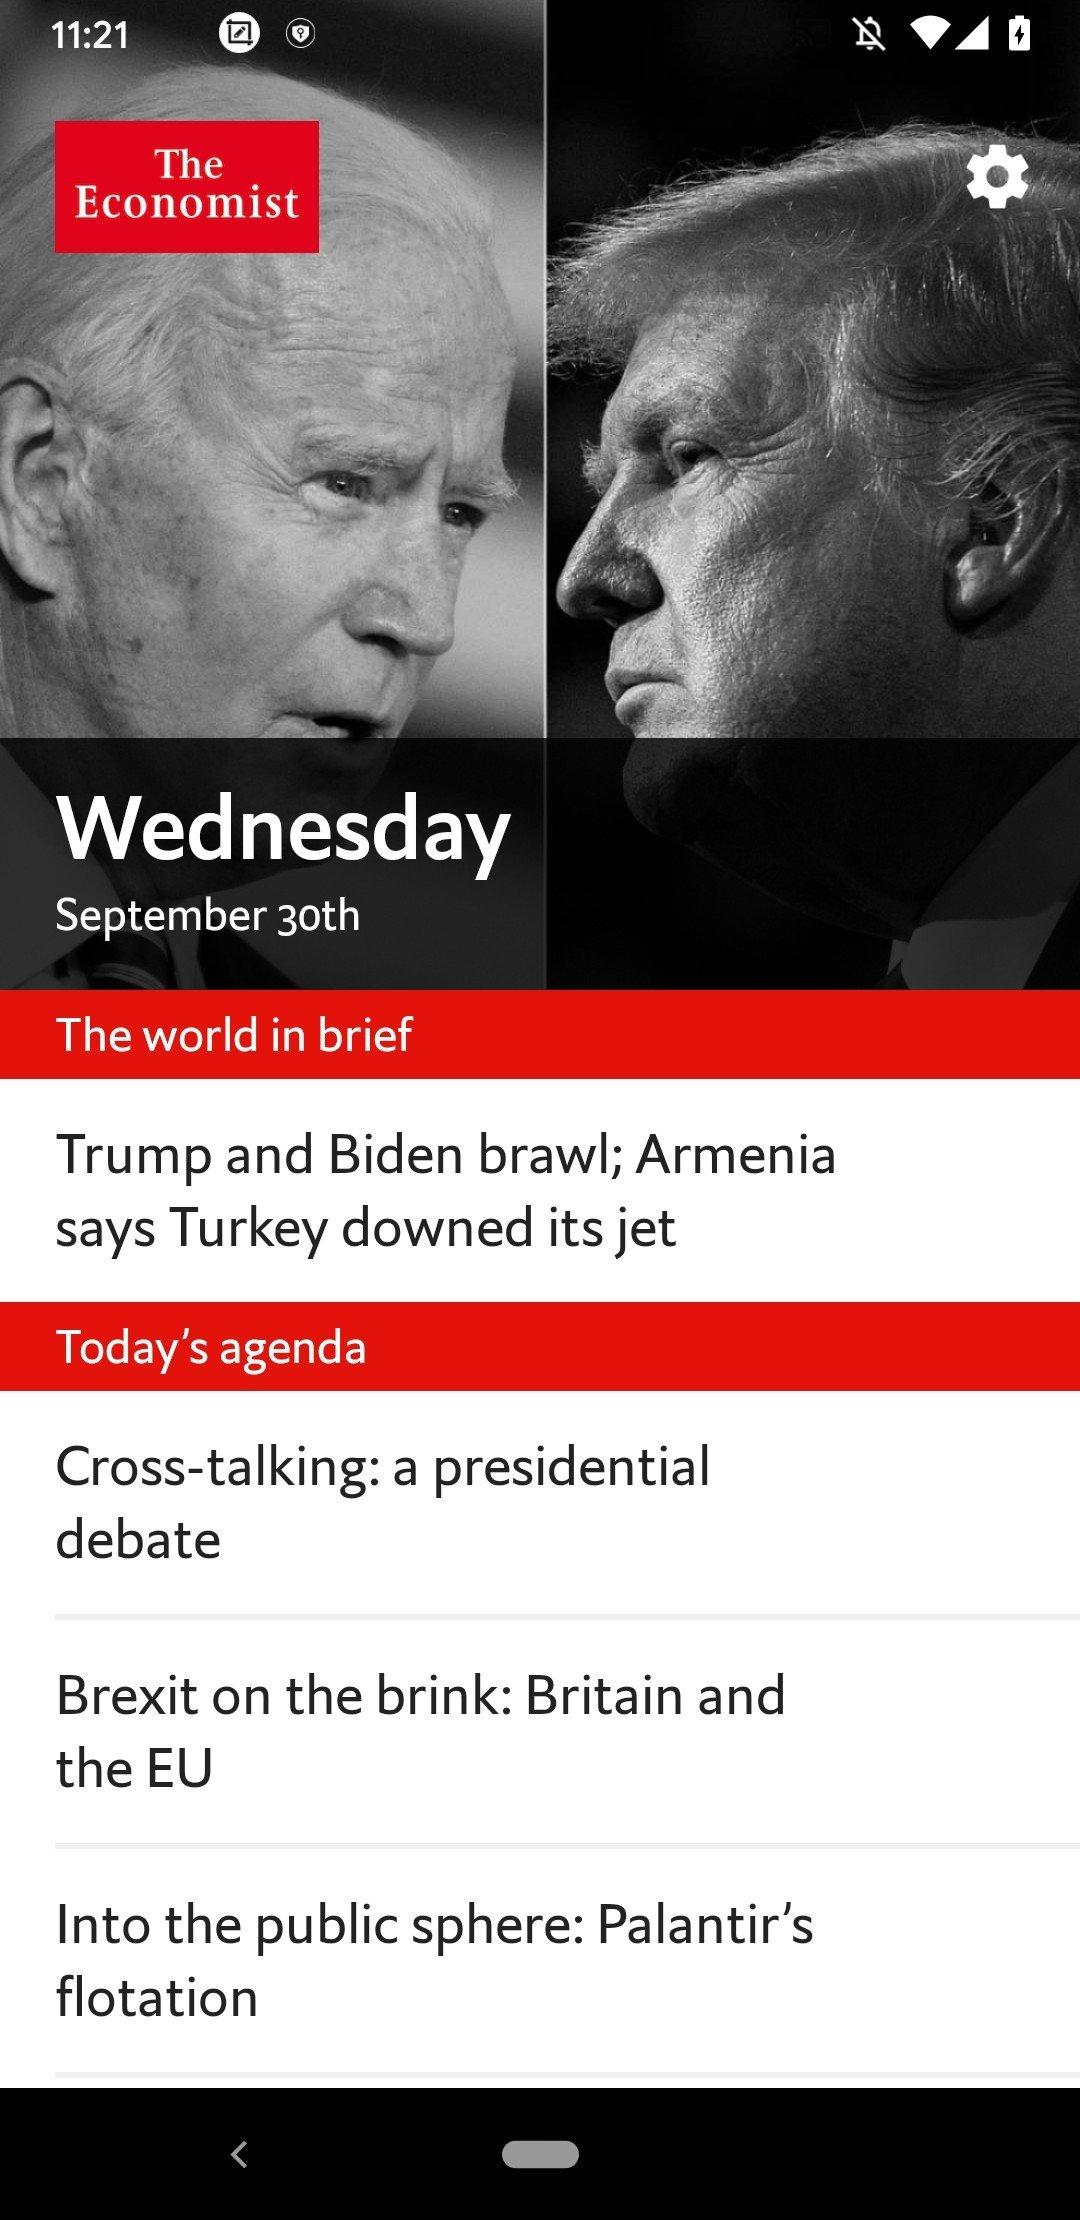 The Economist Espresso Android image 5